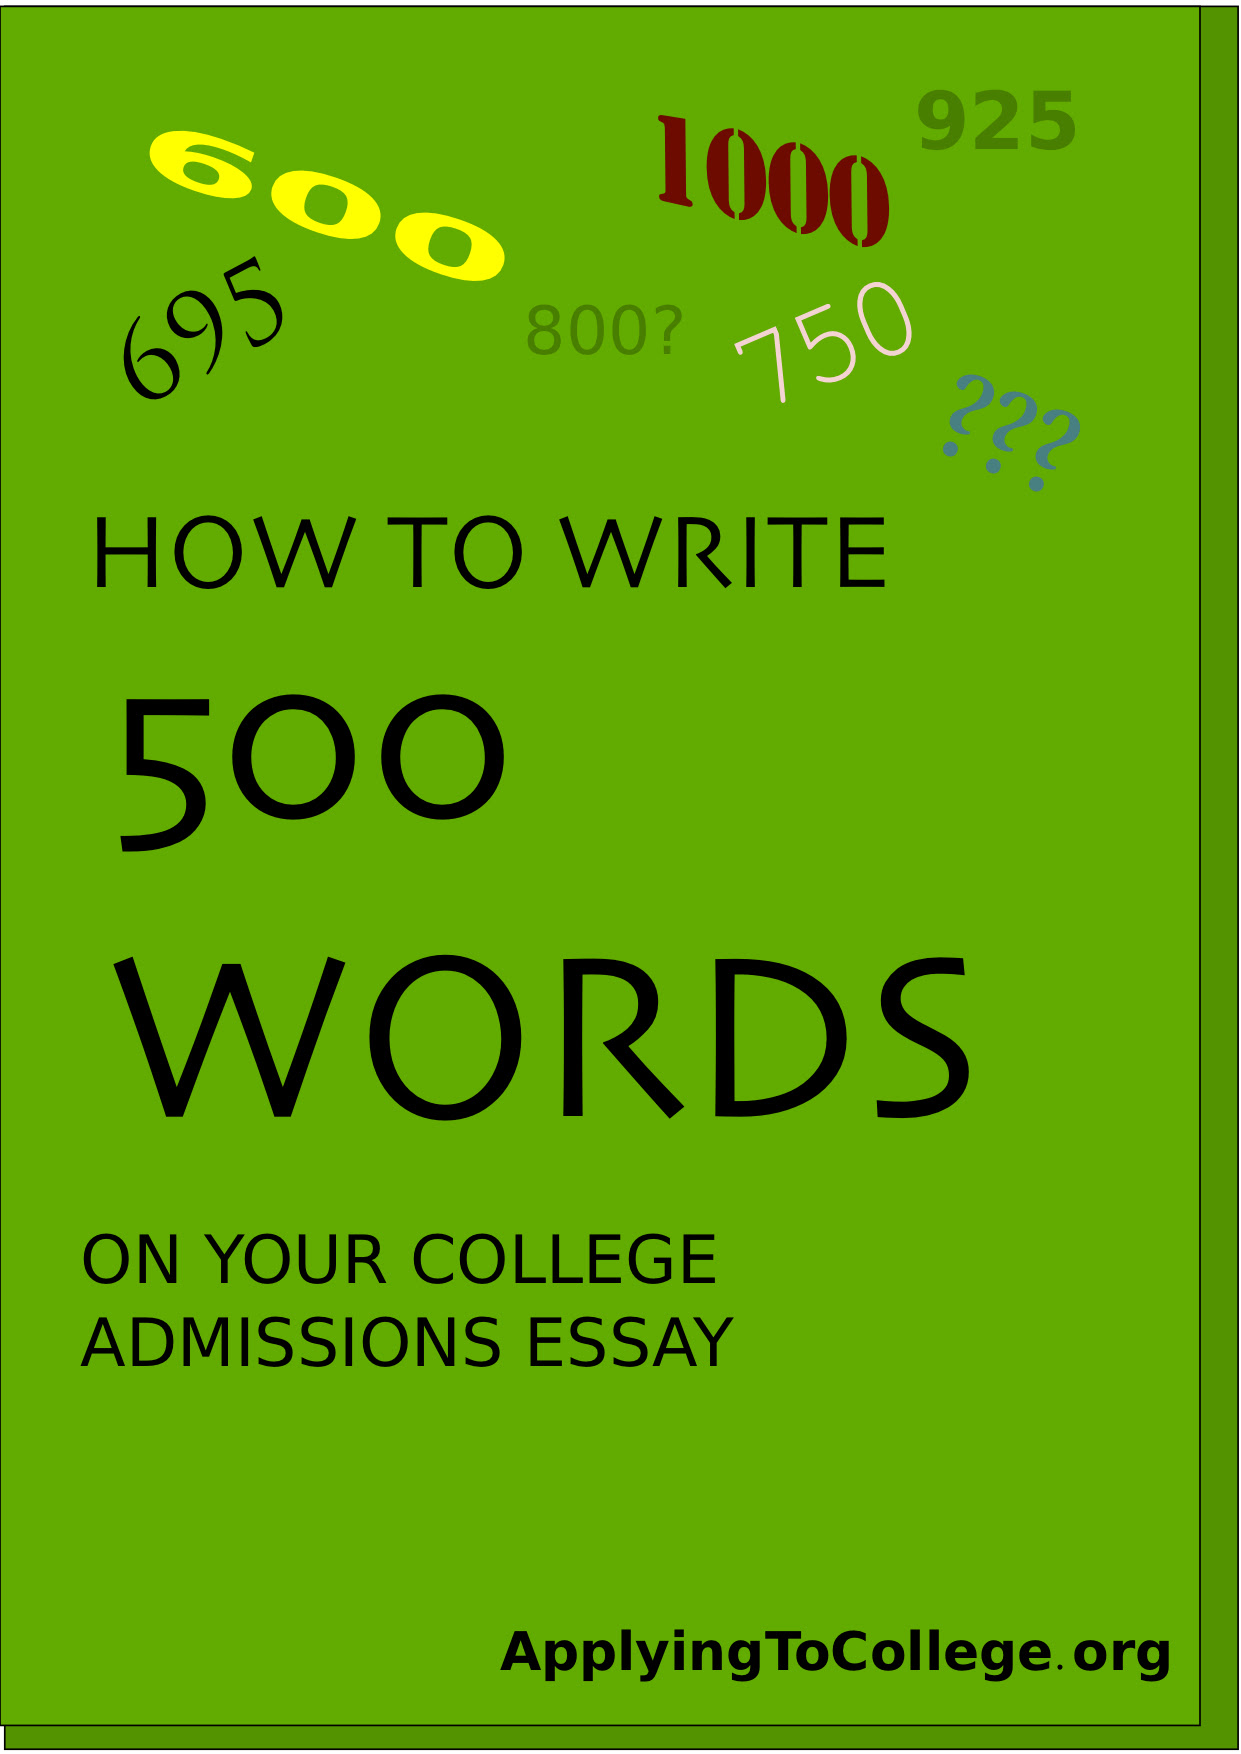 How to write a short essay 500 words